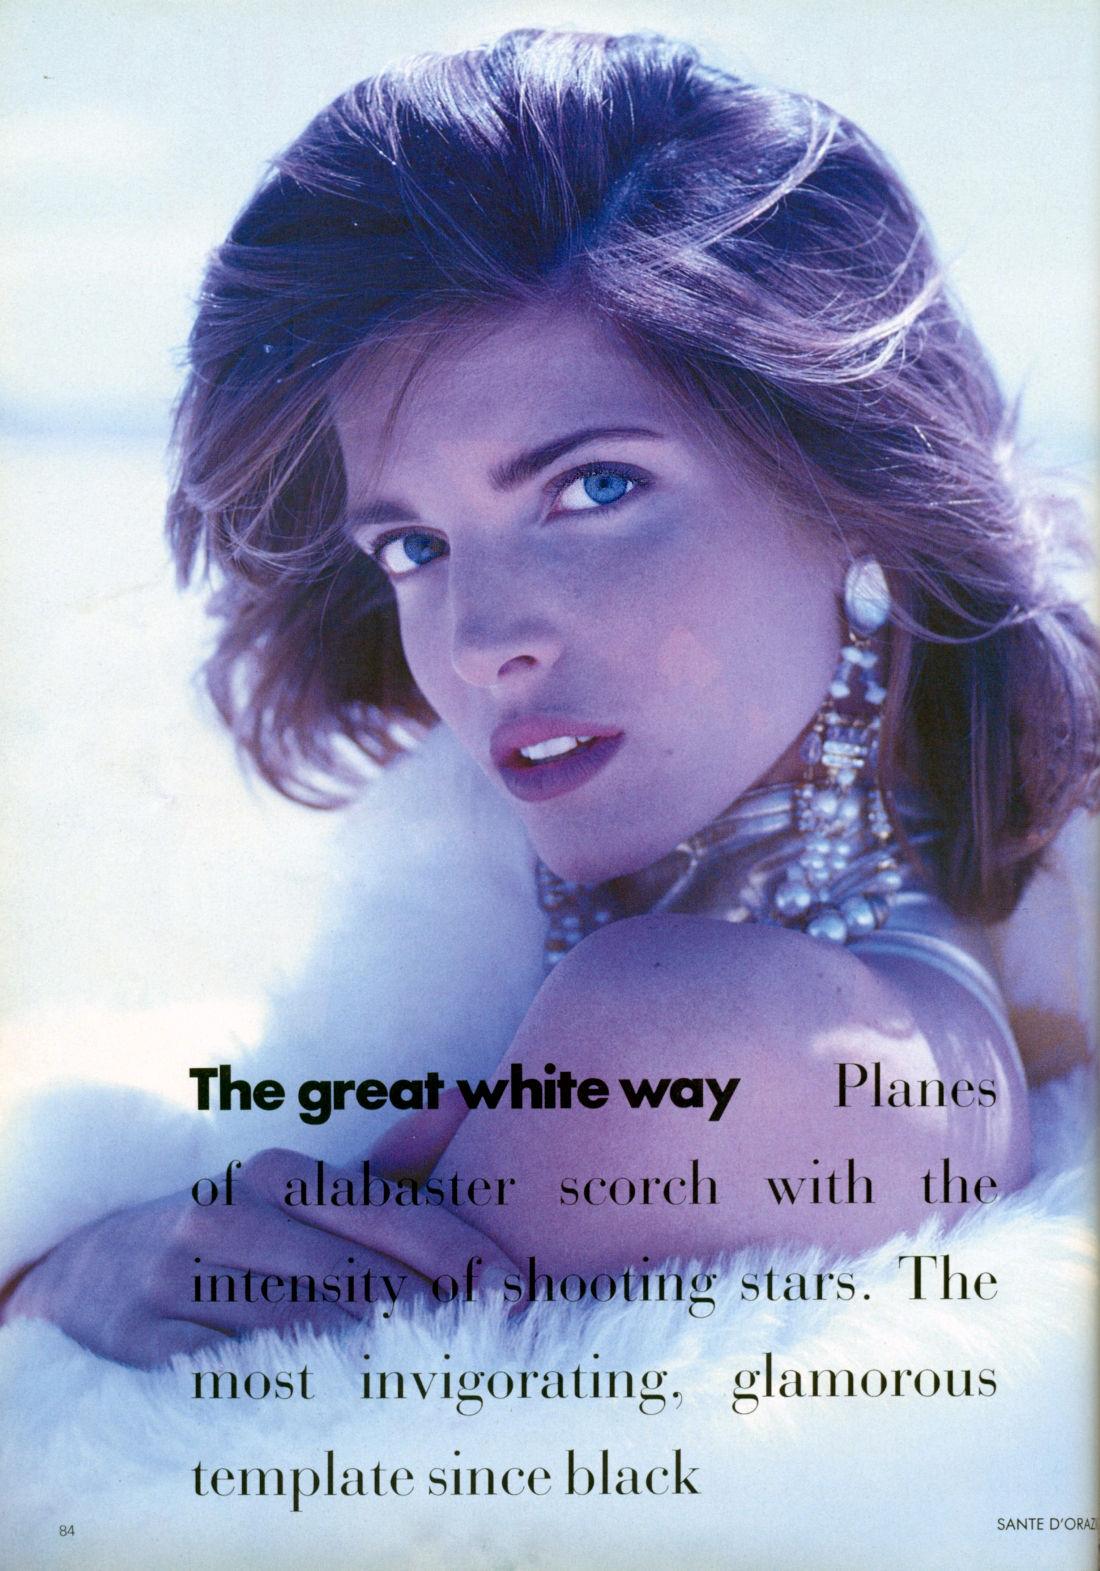 Vogue (UK) July 1990 | Stephanie Seymour 01.jpg